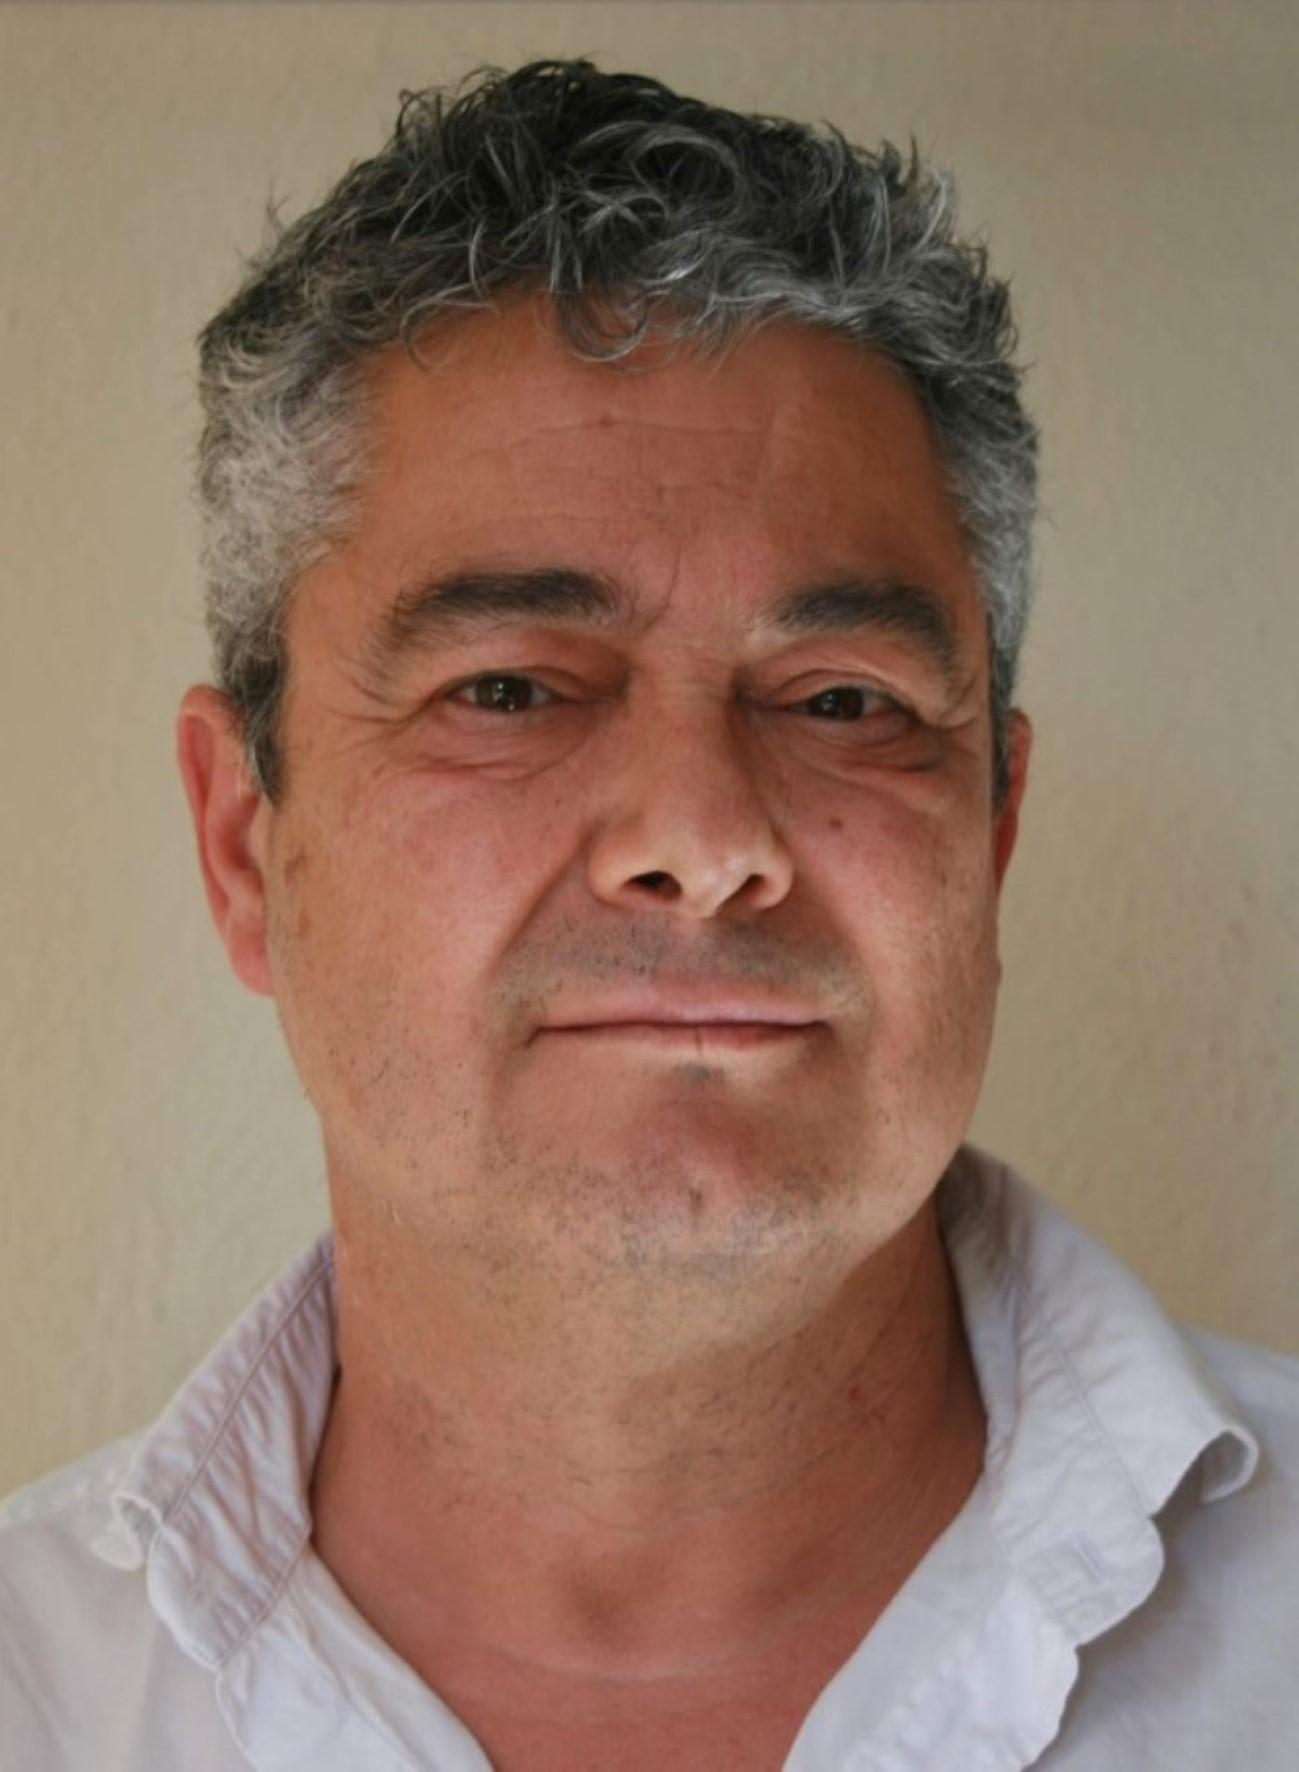 Agustín Aretio Gómez